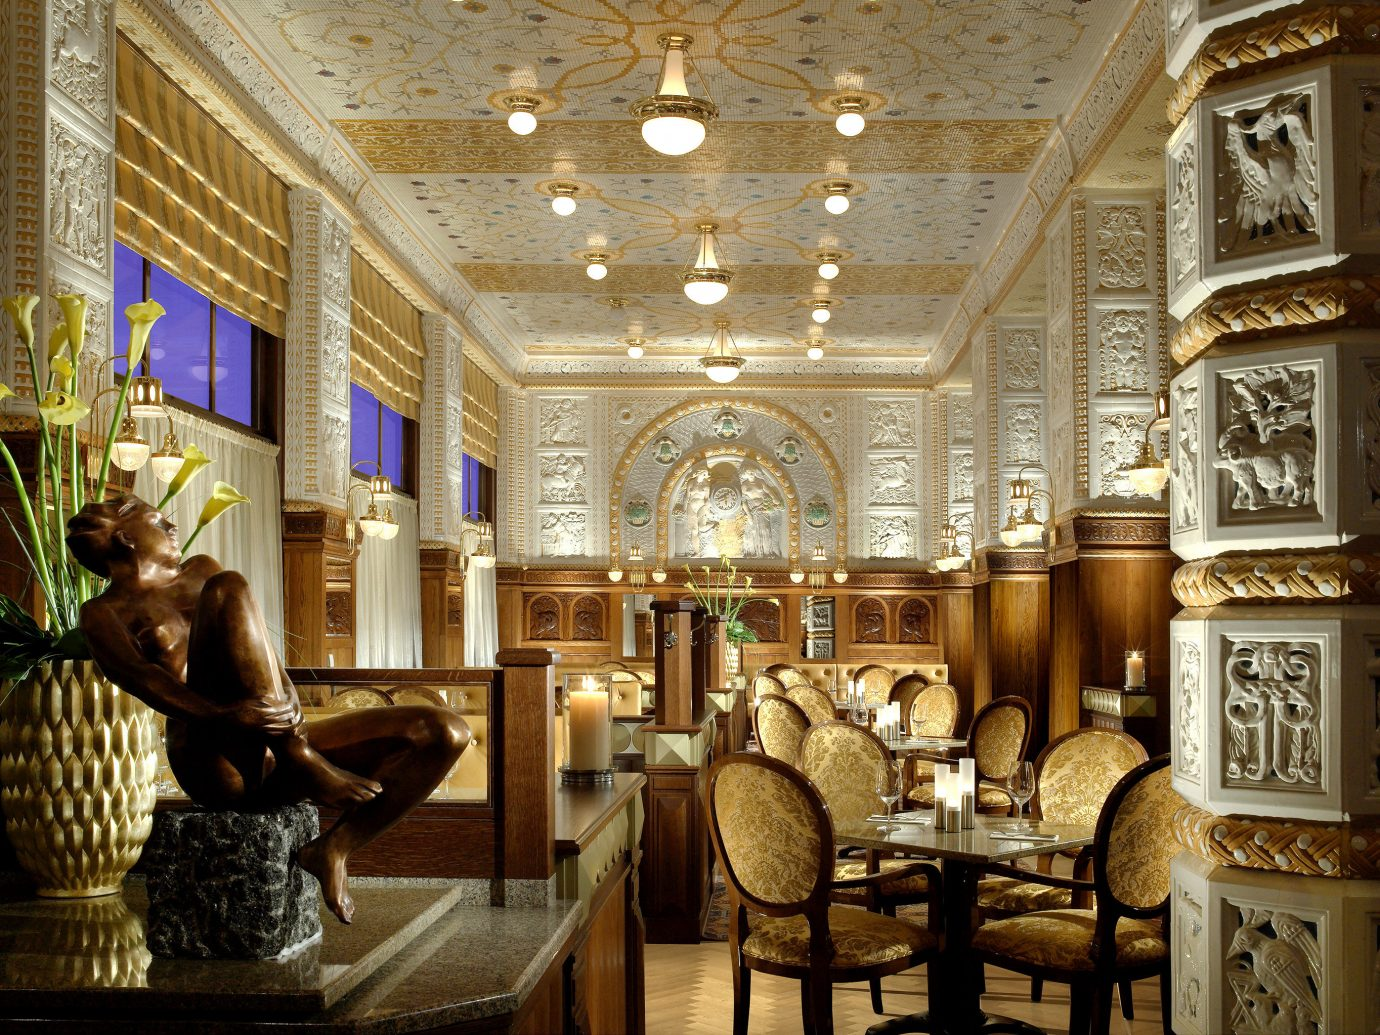 Bar Budget Dining Drink Eat Elegant Hotels indoor Lobby building ceiling estate palace interior design ancient history ballroom mansion synagogue tourist attraction furniture several